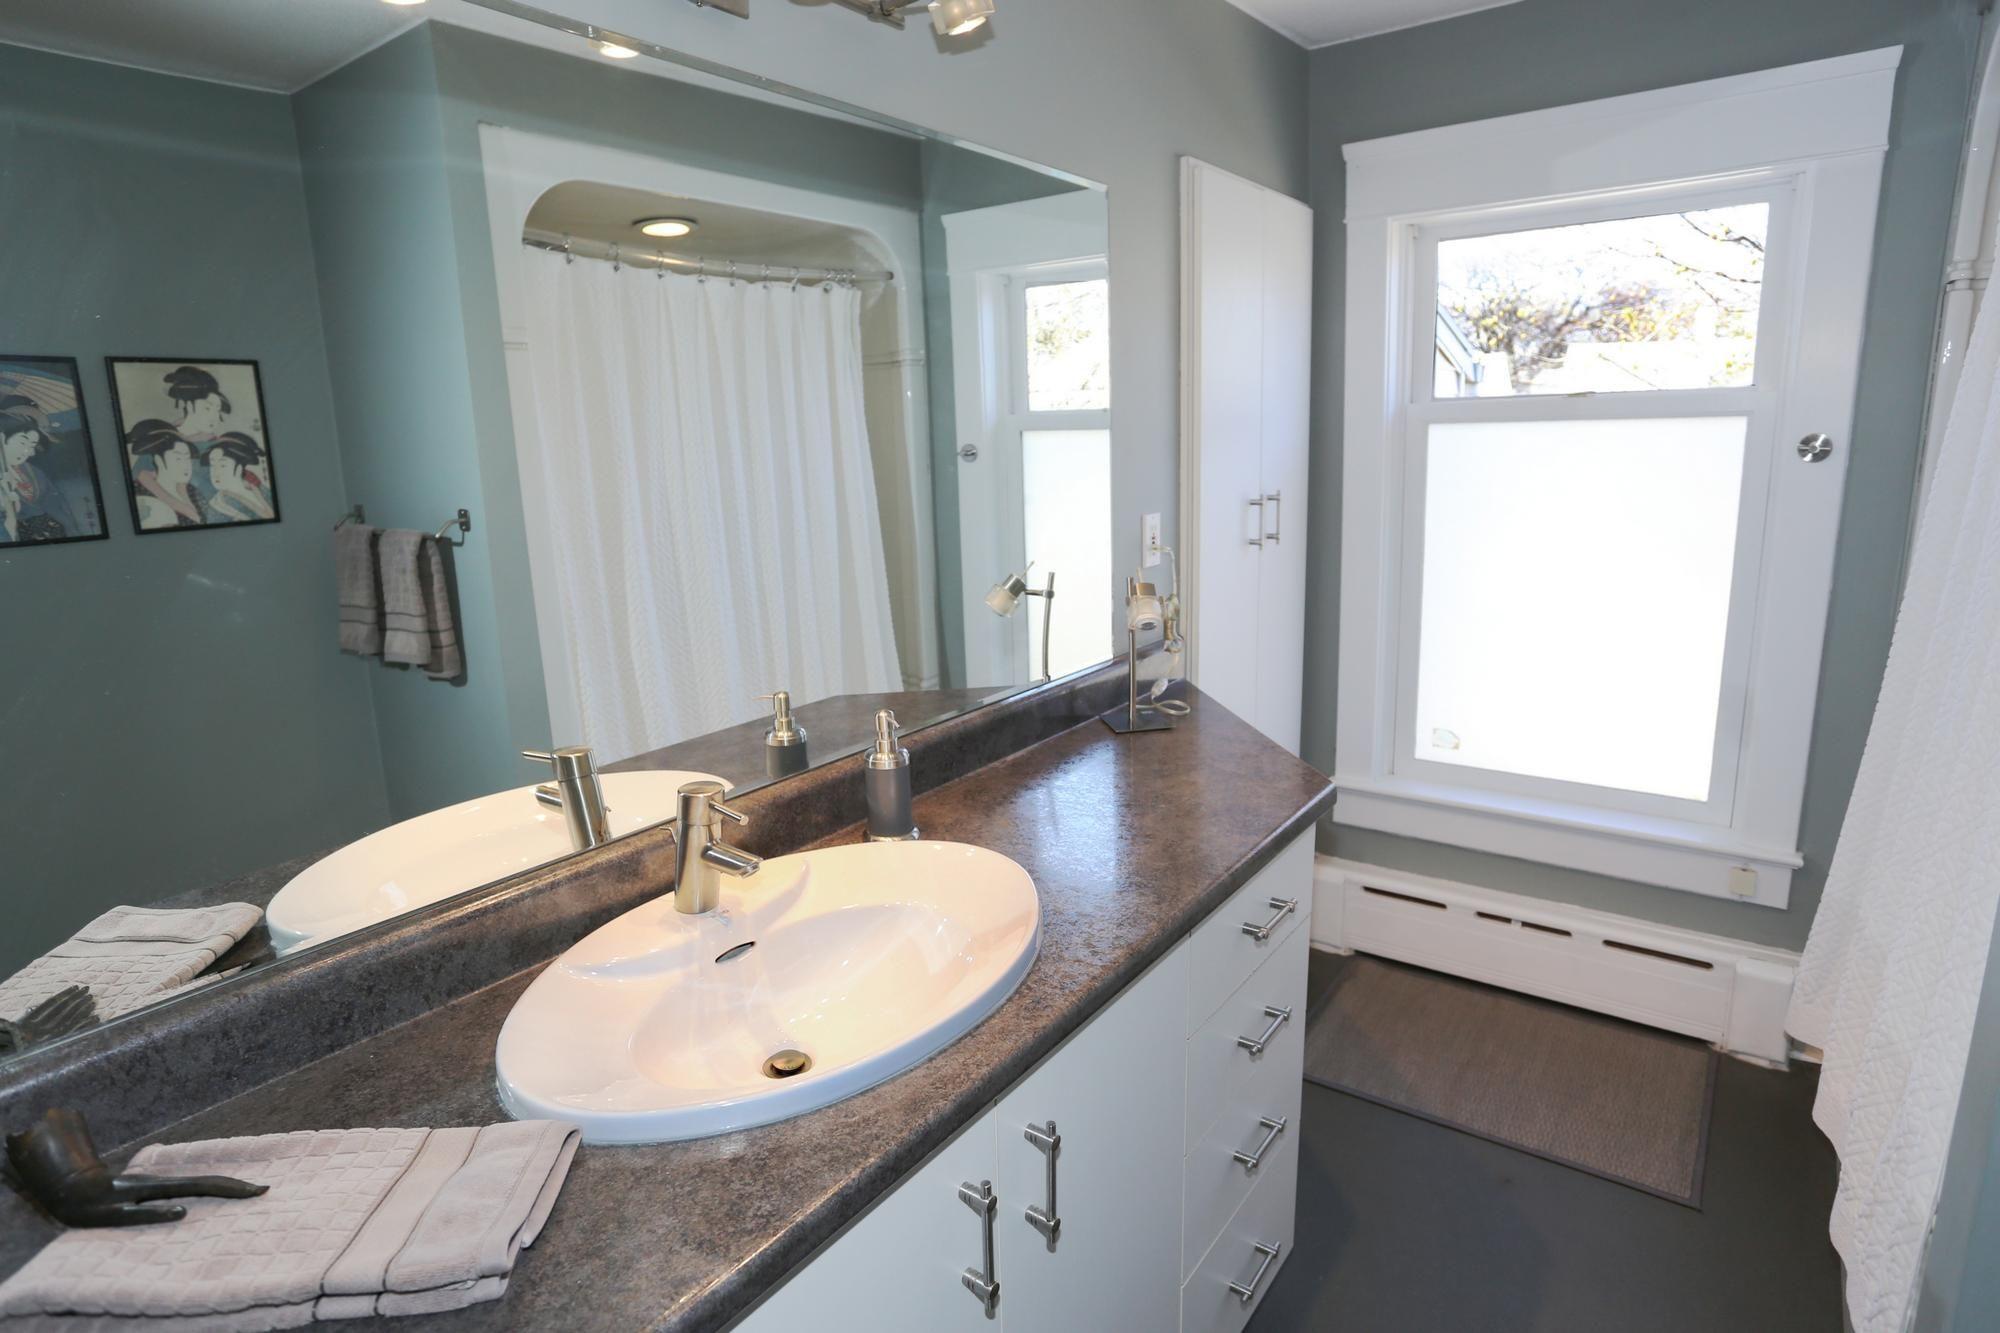 Photo 21: Photos: 96 Home Street in Winnipeg: Wolseley Single Family Detached for sale (5B)  : MLS®# 1810985